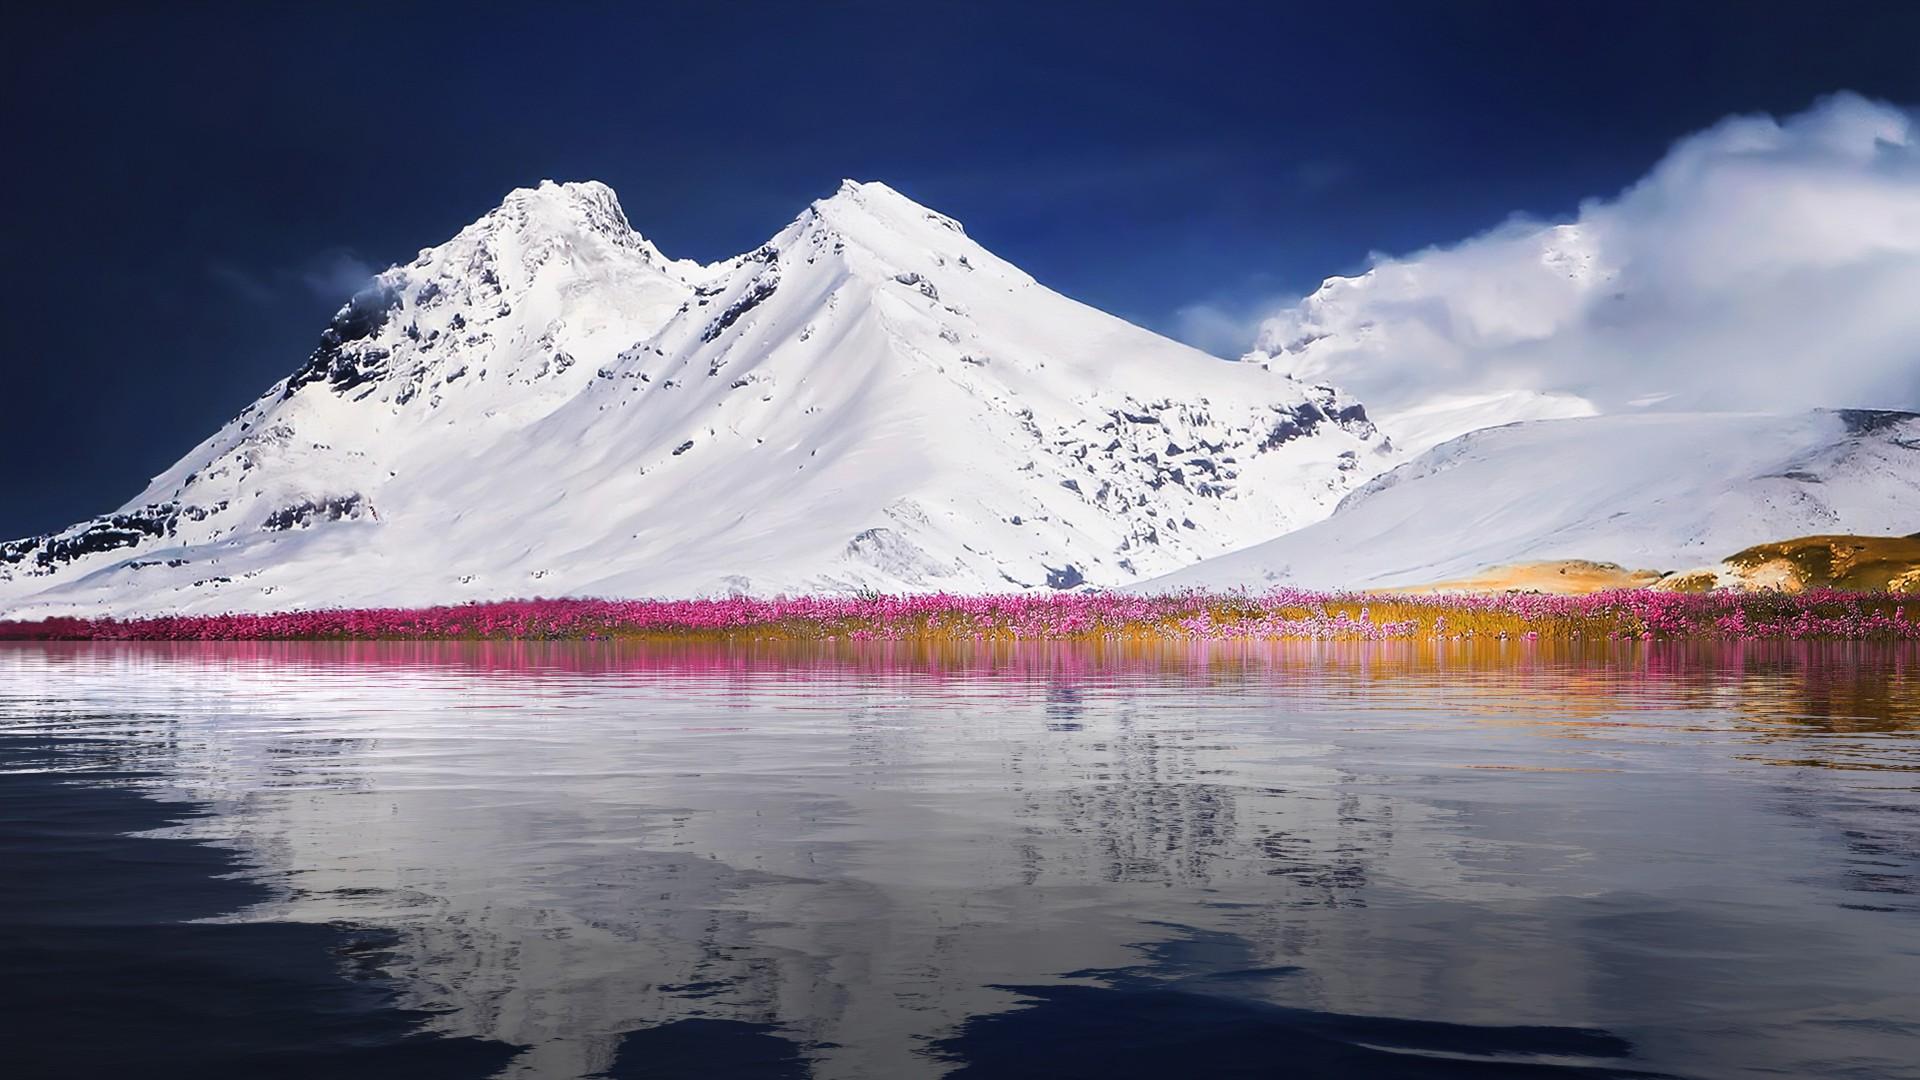 Download Fall Wallpaper For Laptops Winter Mountain Landscape 4k Wallpapers Hd Wallpapers